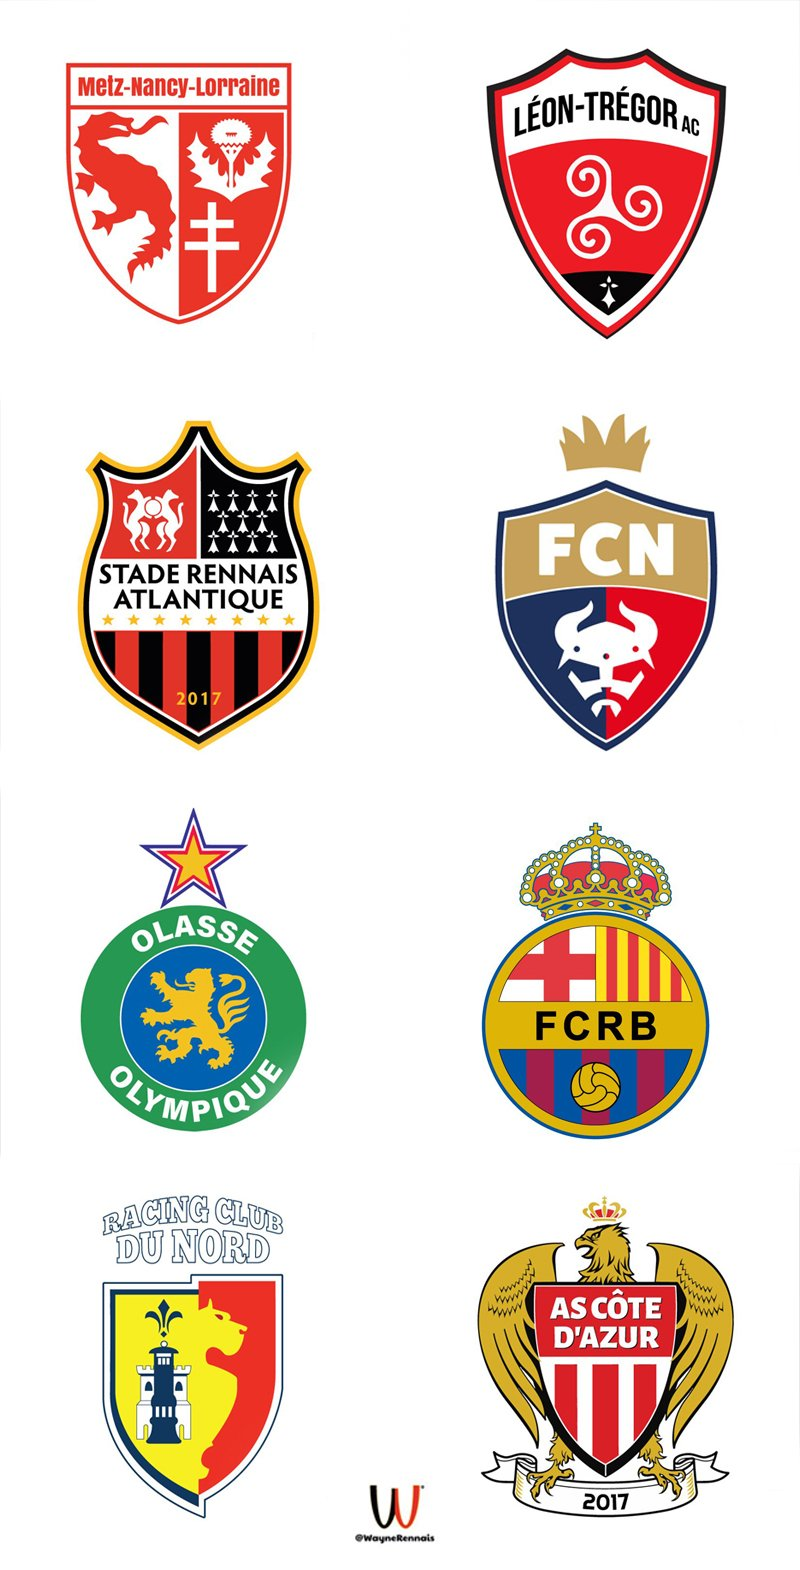 D tournement logo ca match psg om agence com tongui - Logo club foot bresil ...